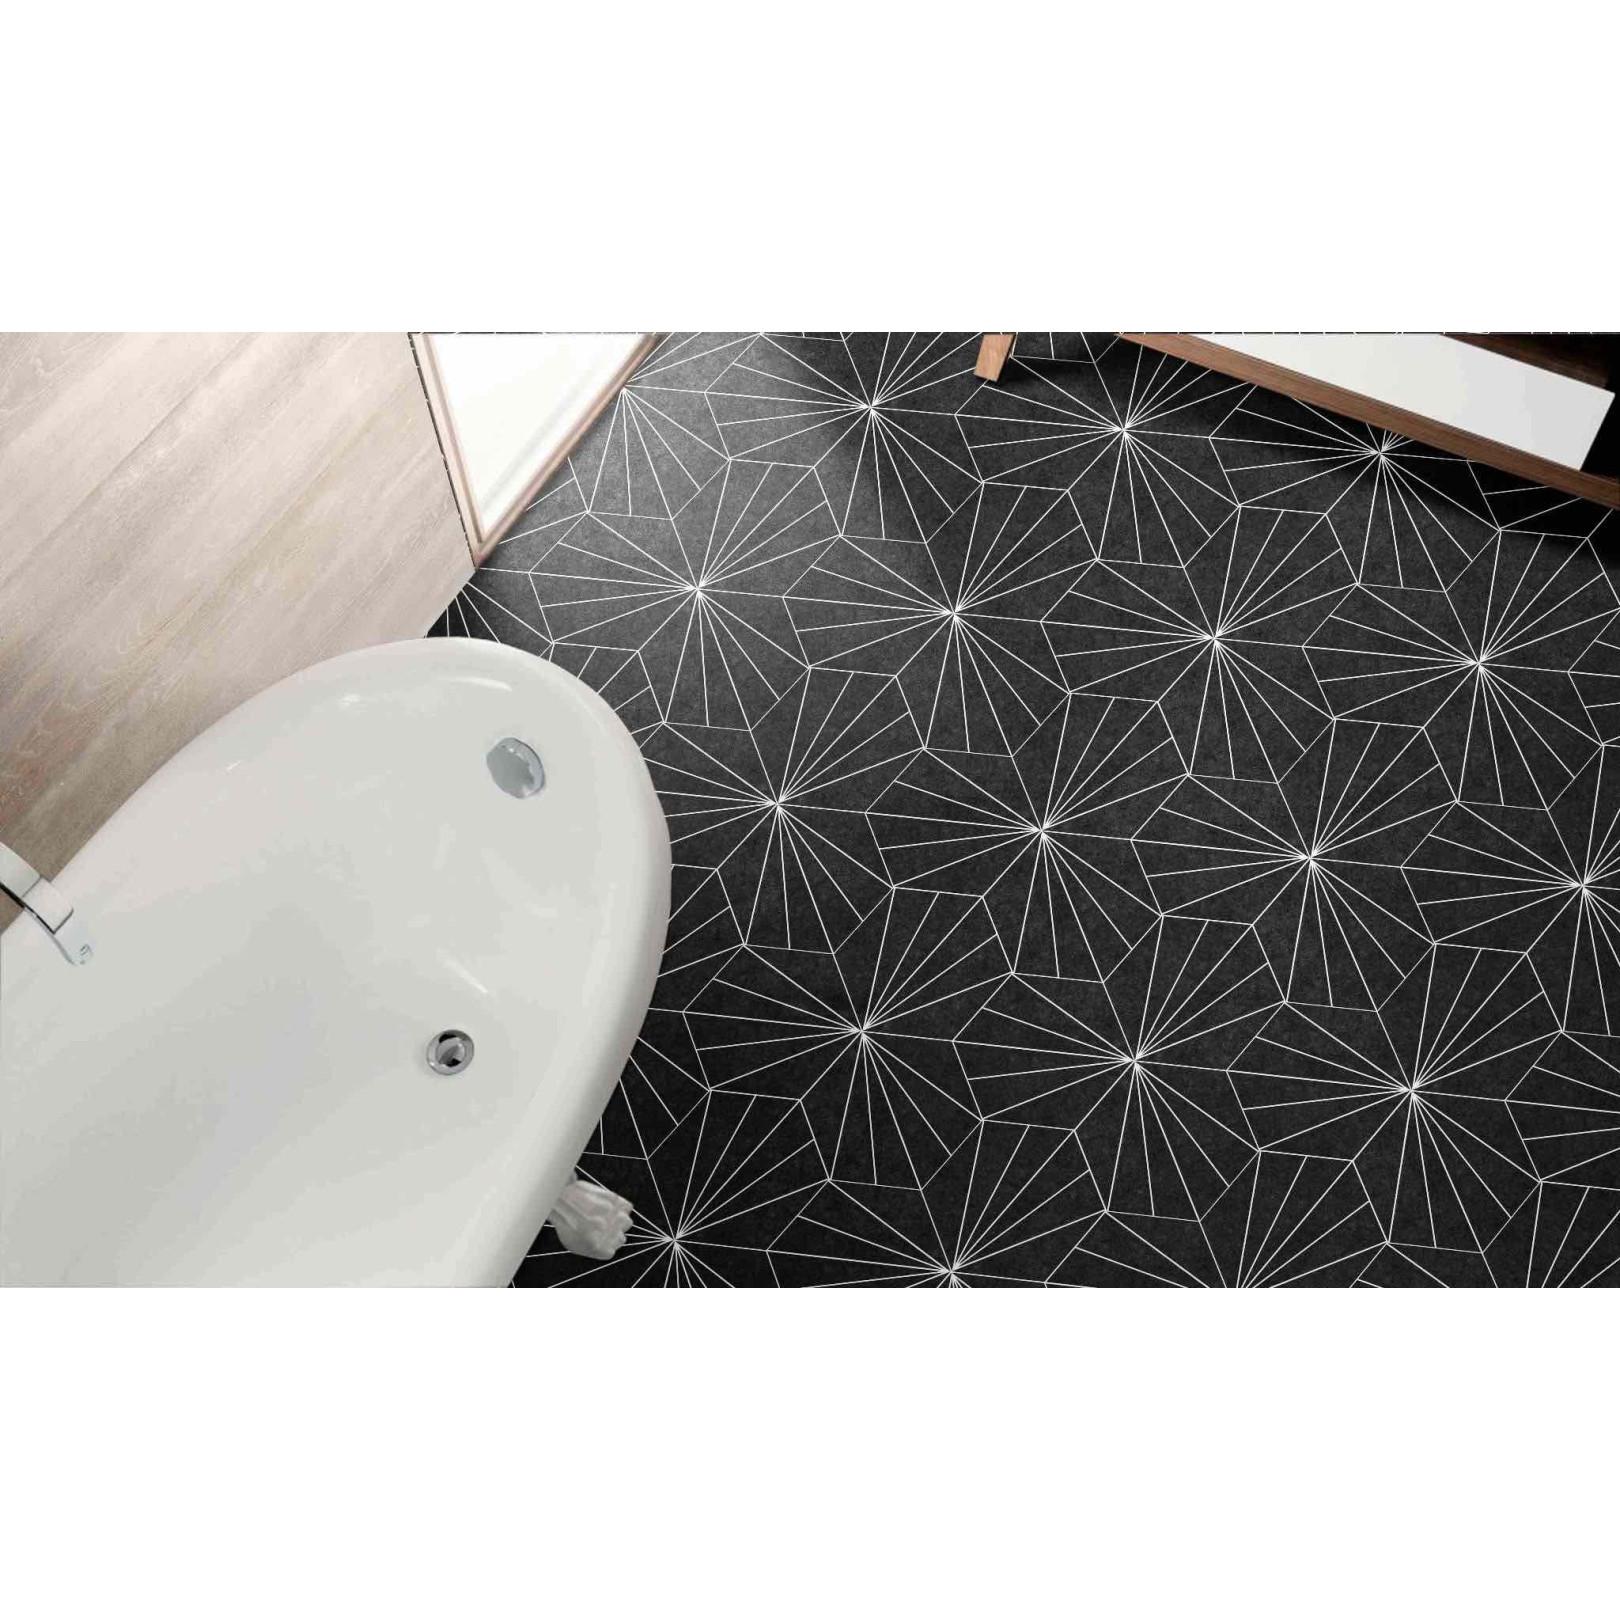 Carrelage grès cérame Hex 25 Aster, hexagone 25x22cm (2 couleurs)